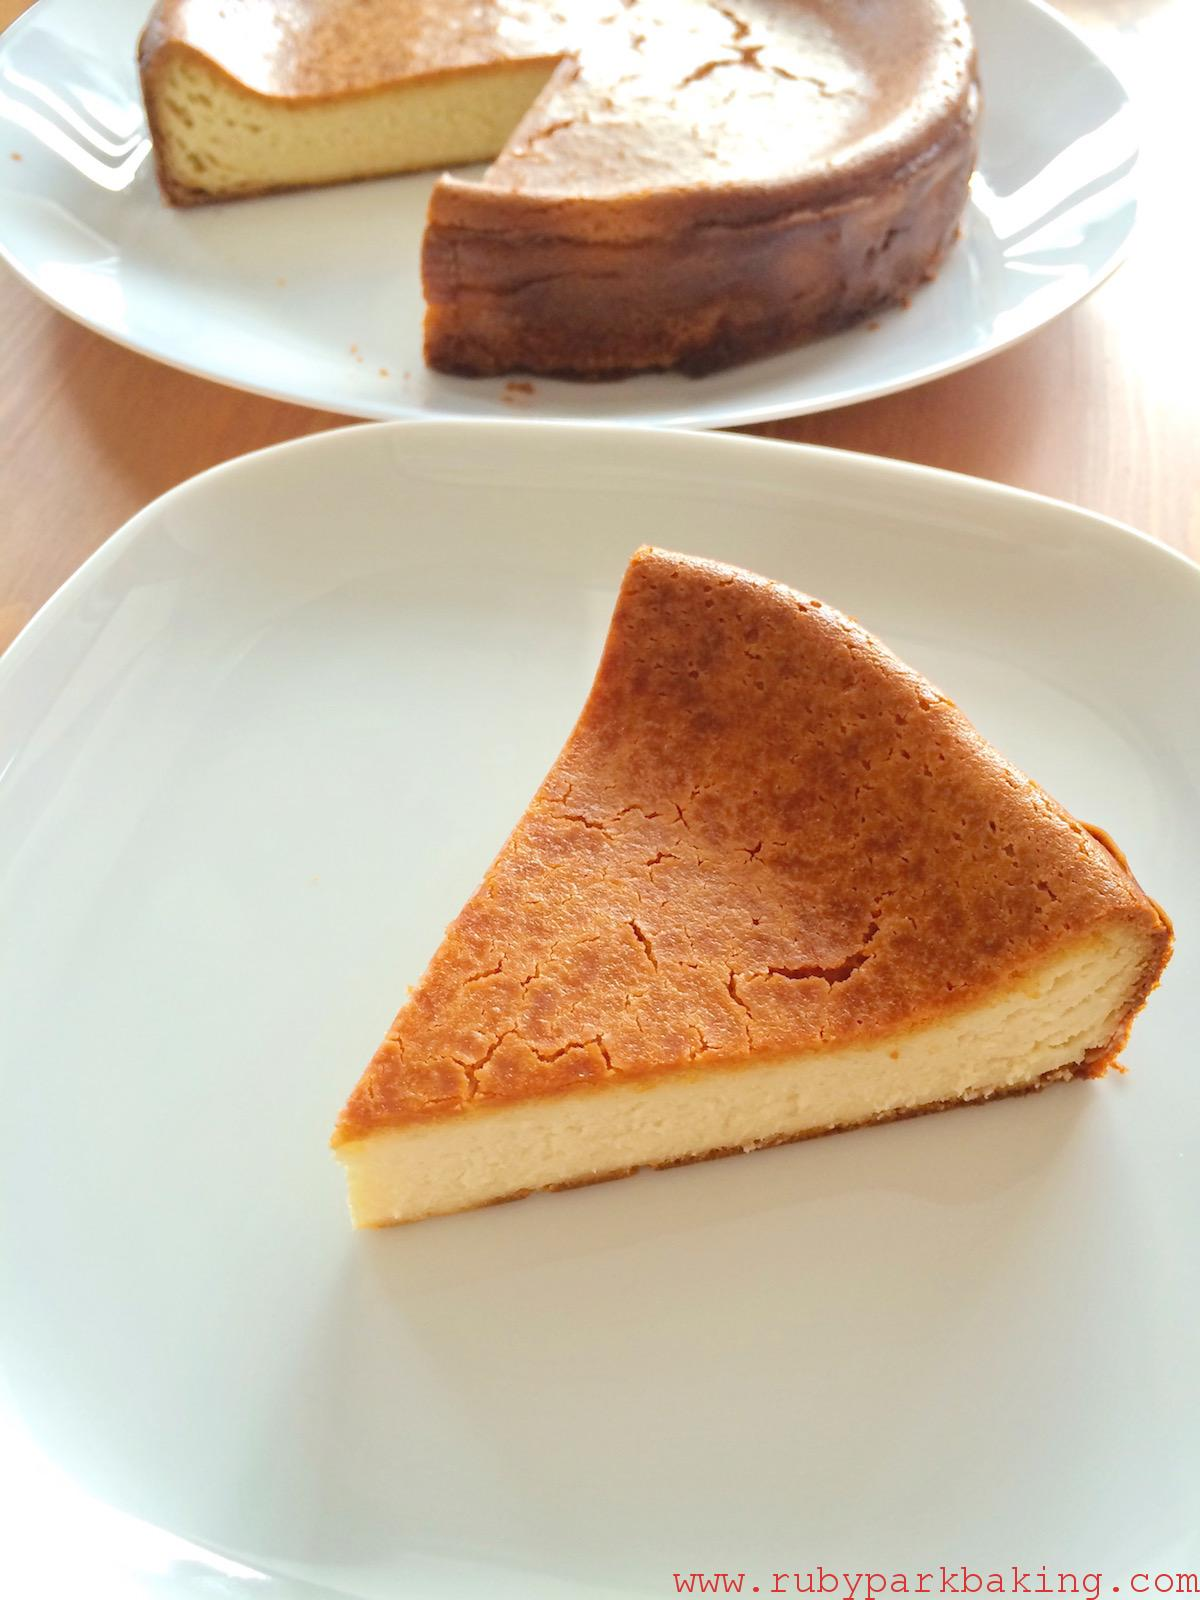 Maple baked cheesecake on rubyparkbaking.com